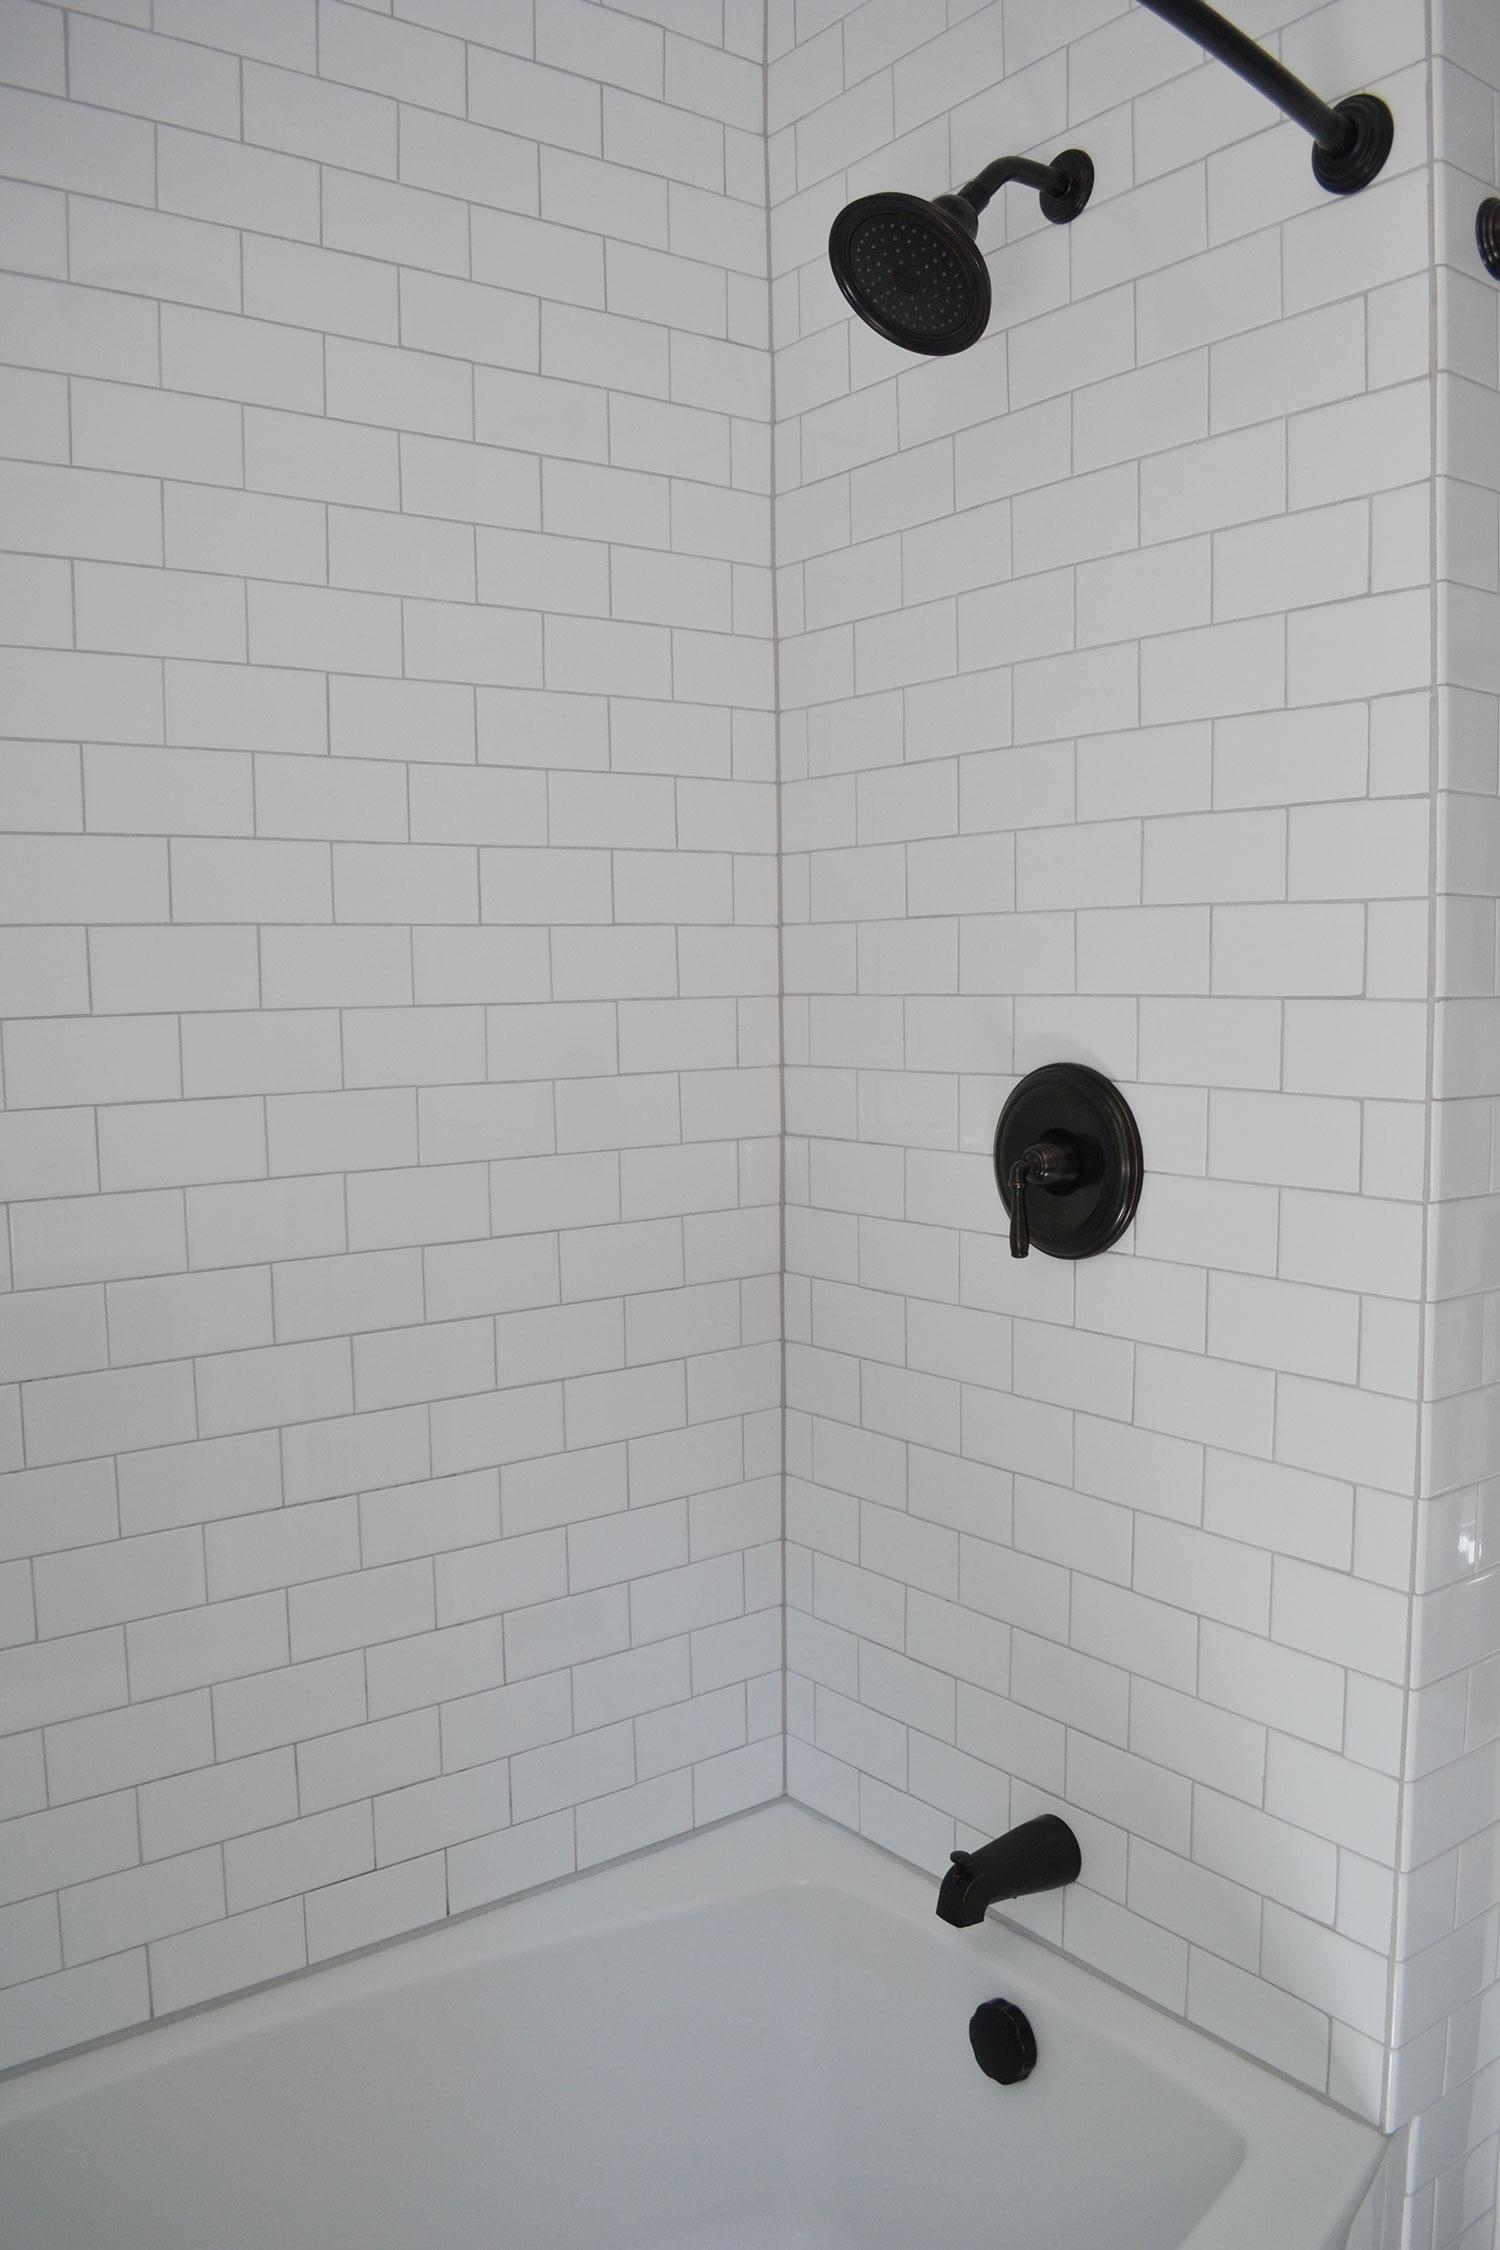 Wonderful 16 Inch Ceiling Tiles Tiny 2 X 12 Ceramic Tile Round 20X20 Ceramic Tile 2X4 Ceiling Tiles Home Depot Old 6 X 6 Ceramic Wall Tile Dark8X8 White Floor Tile 1930s Bathroom Remodel \u2013 Reveal \u2013 Life Is Sweet As A Peach